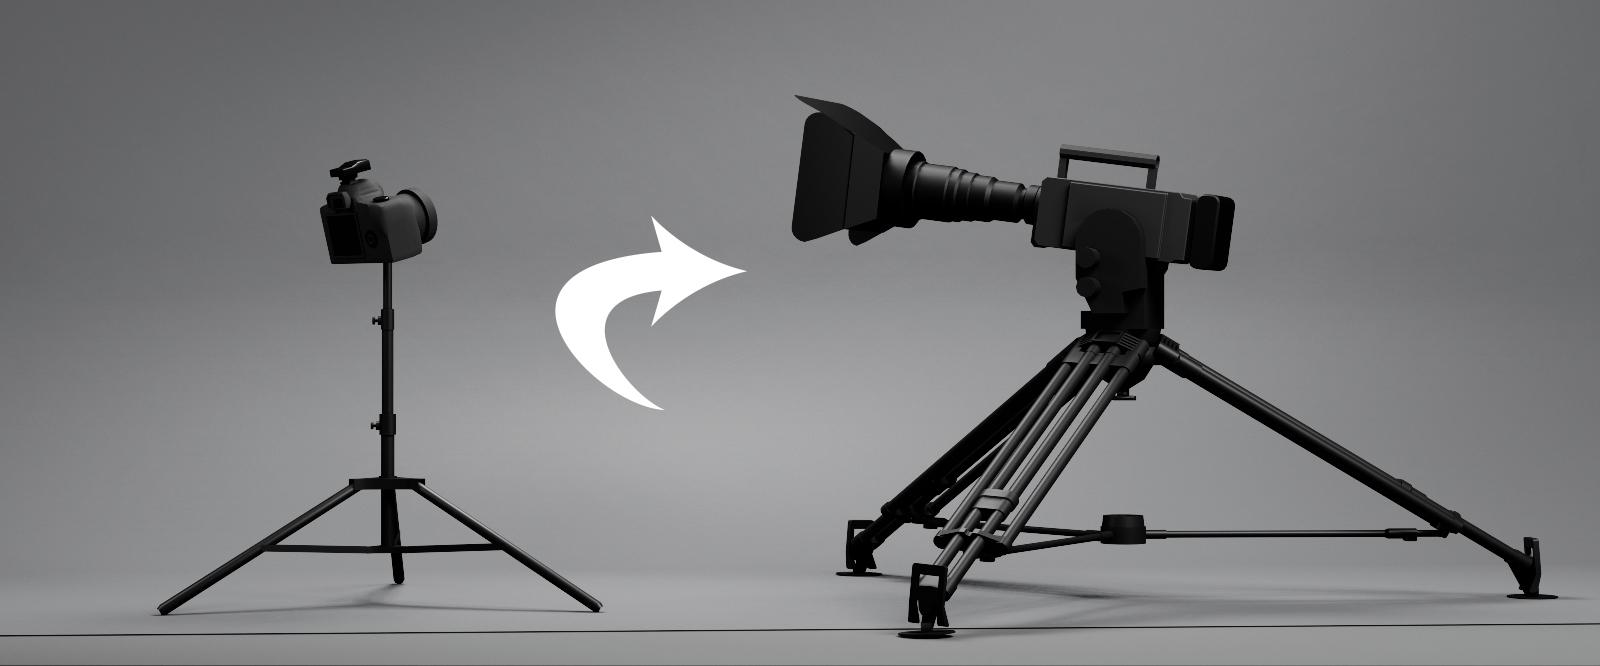 set.a.light-3D-V2.5-New_Video_Camera